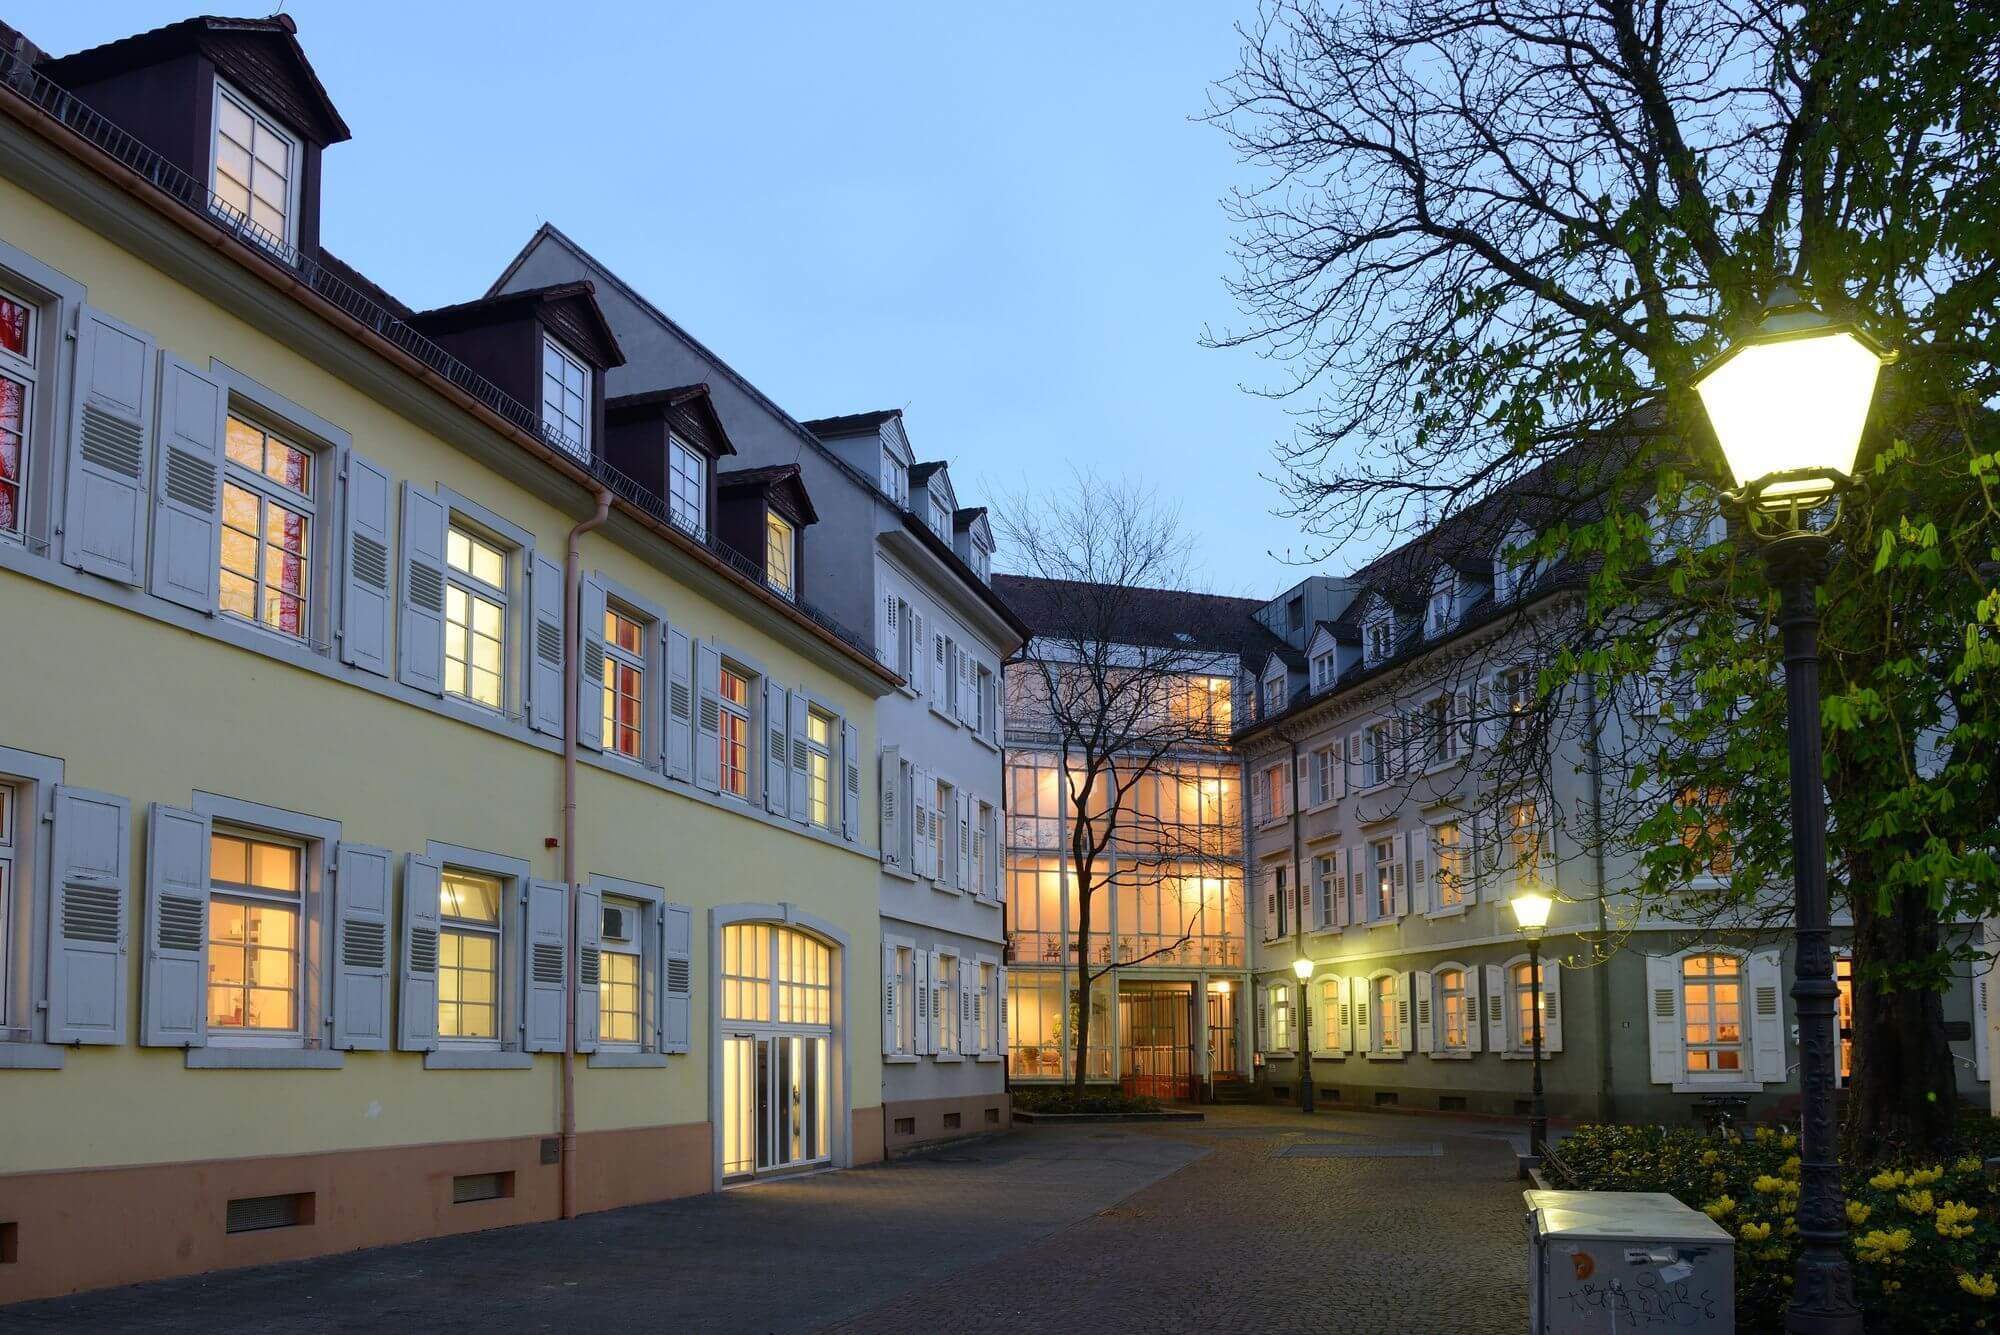 Karl Siebert Haus